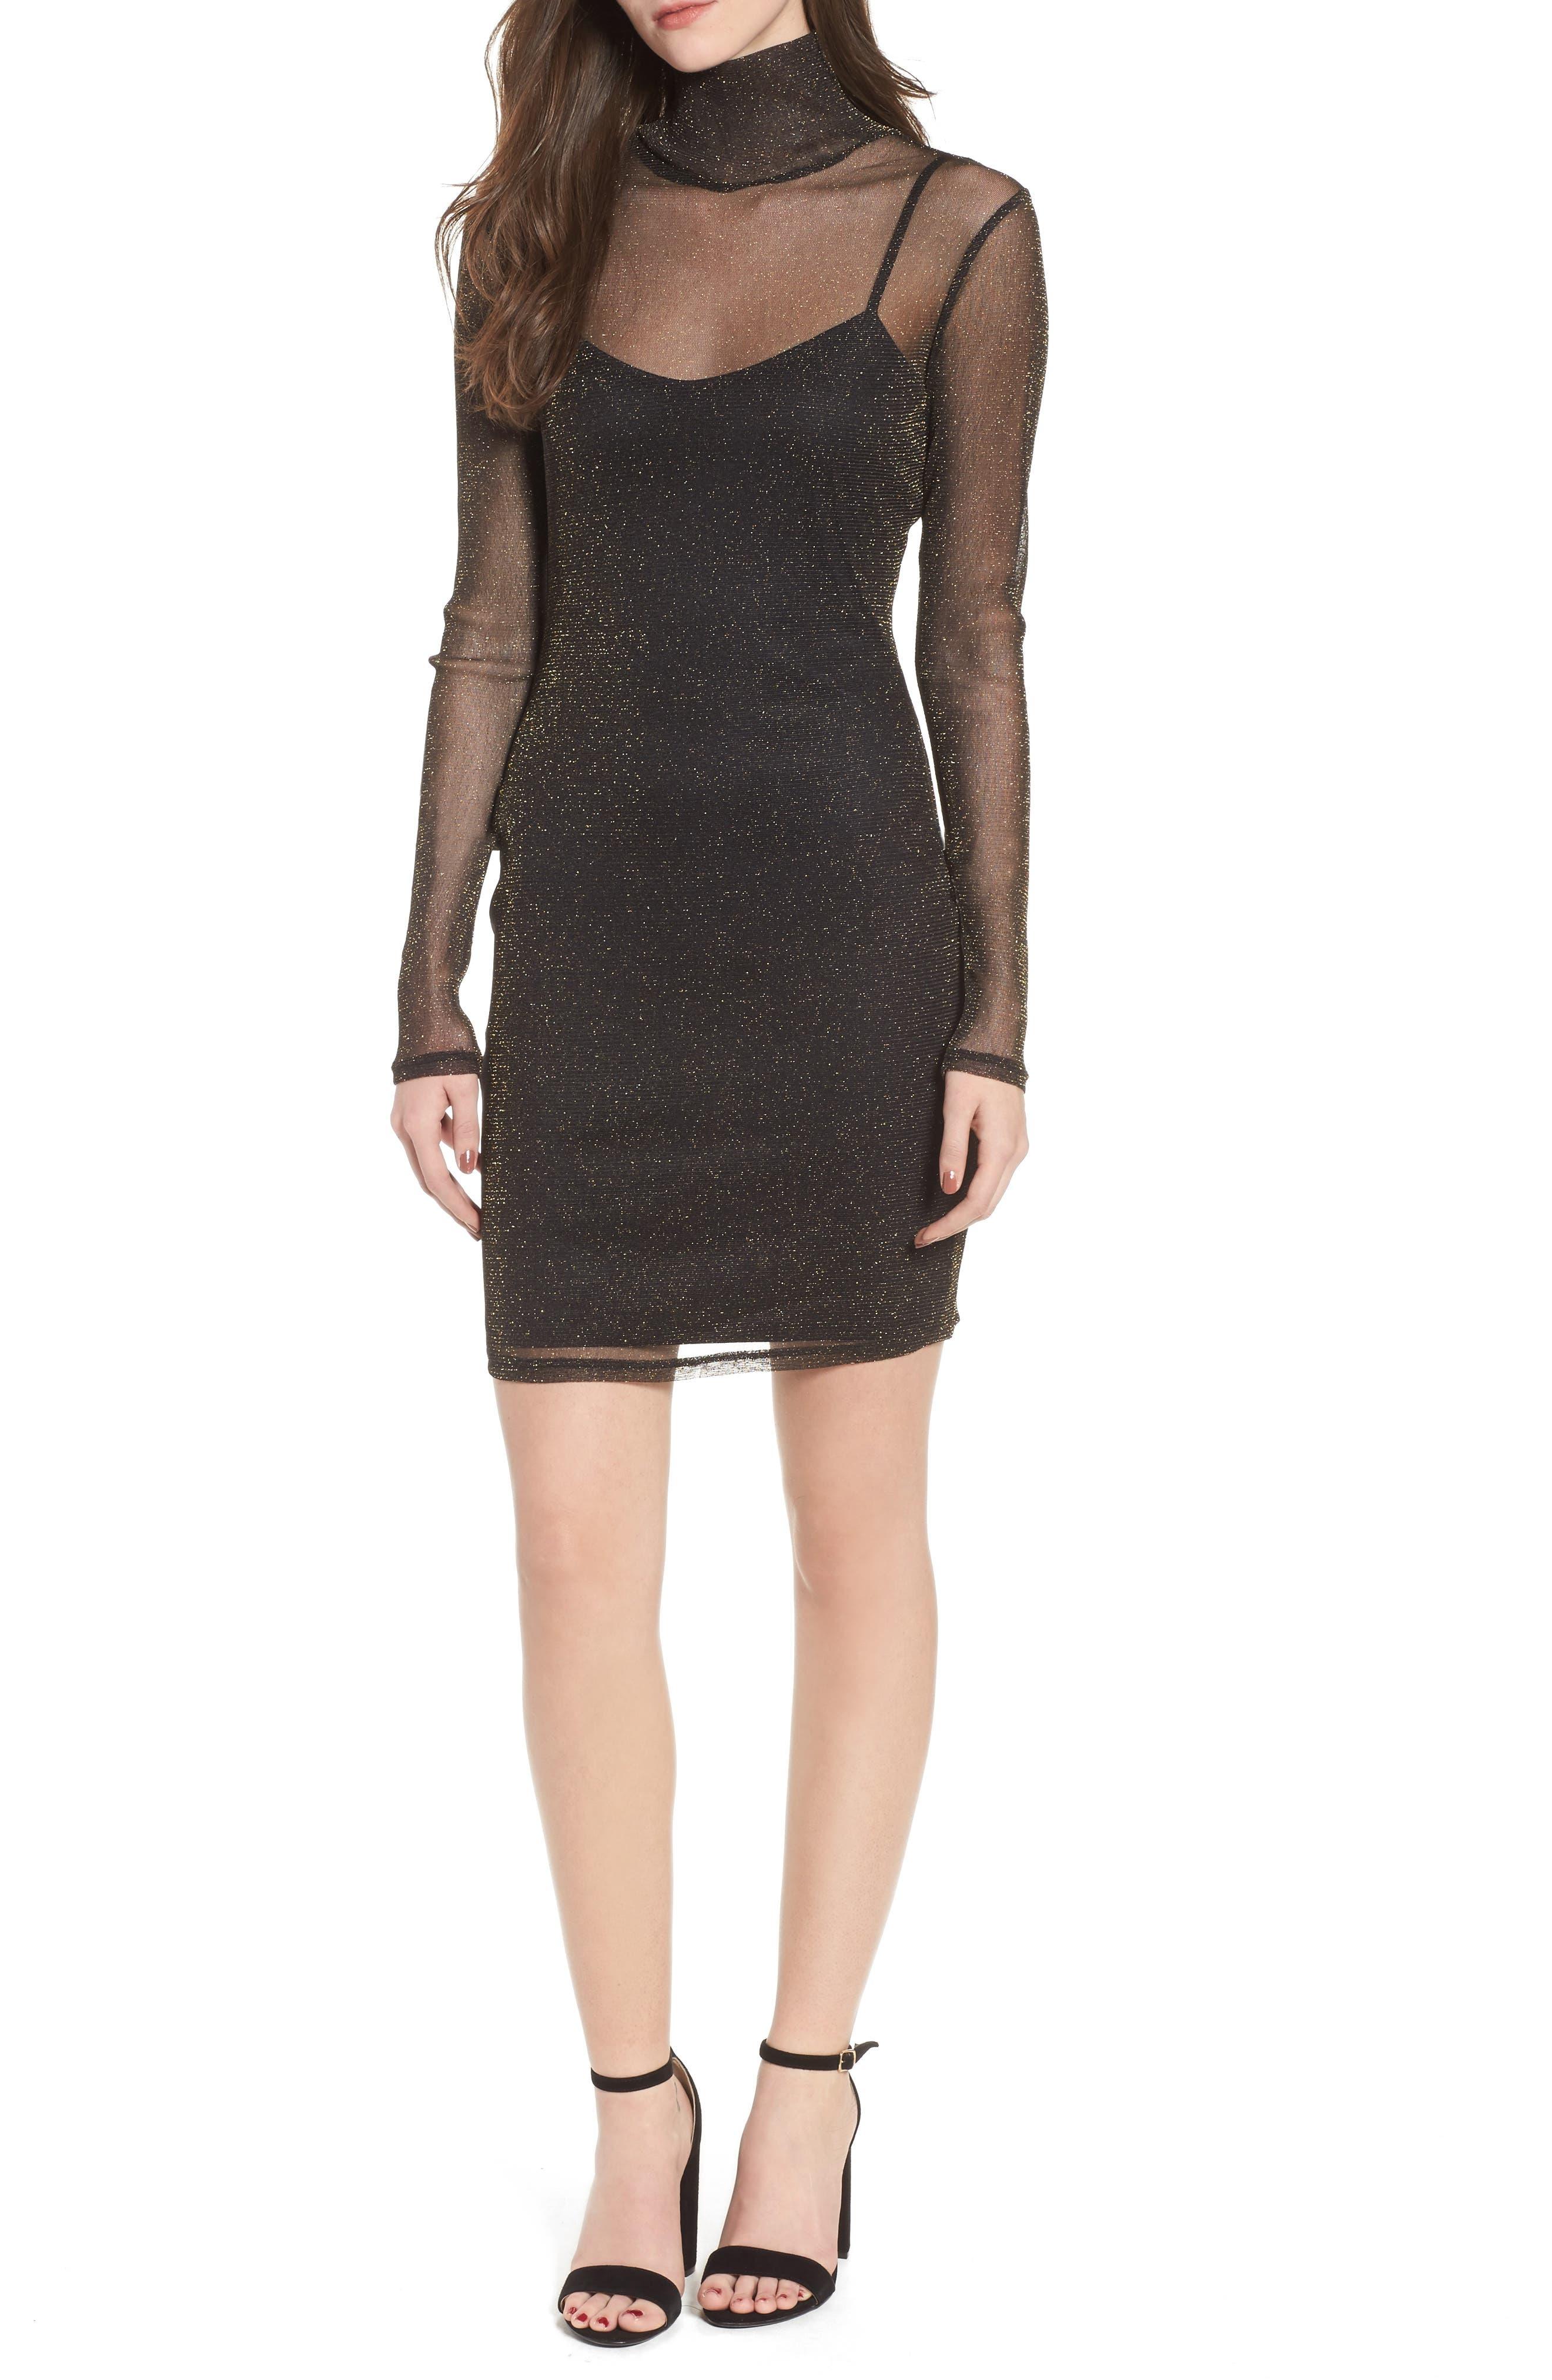 Alternate Image 1 Selected - Love, Fire Metallic Mesh Body-Con Dress